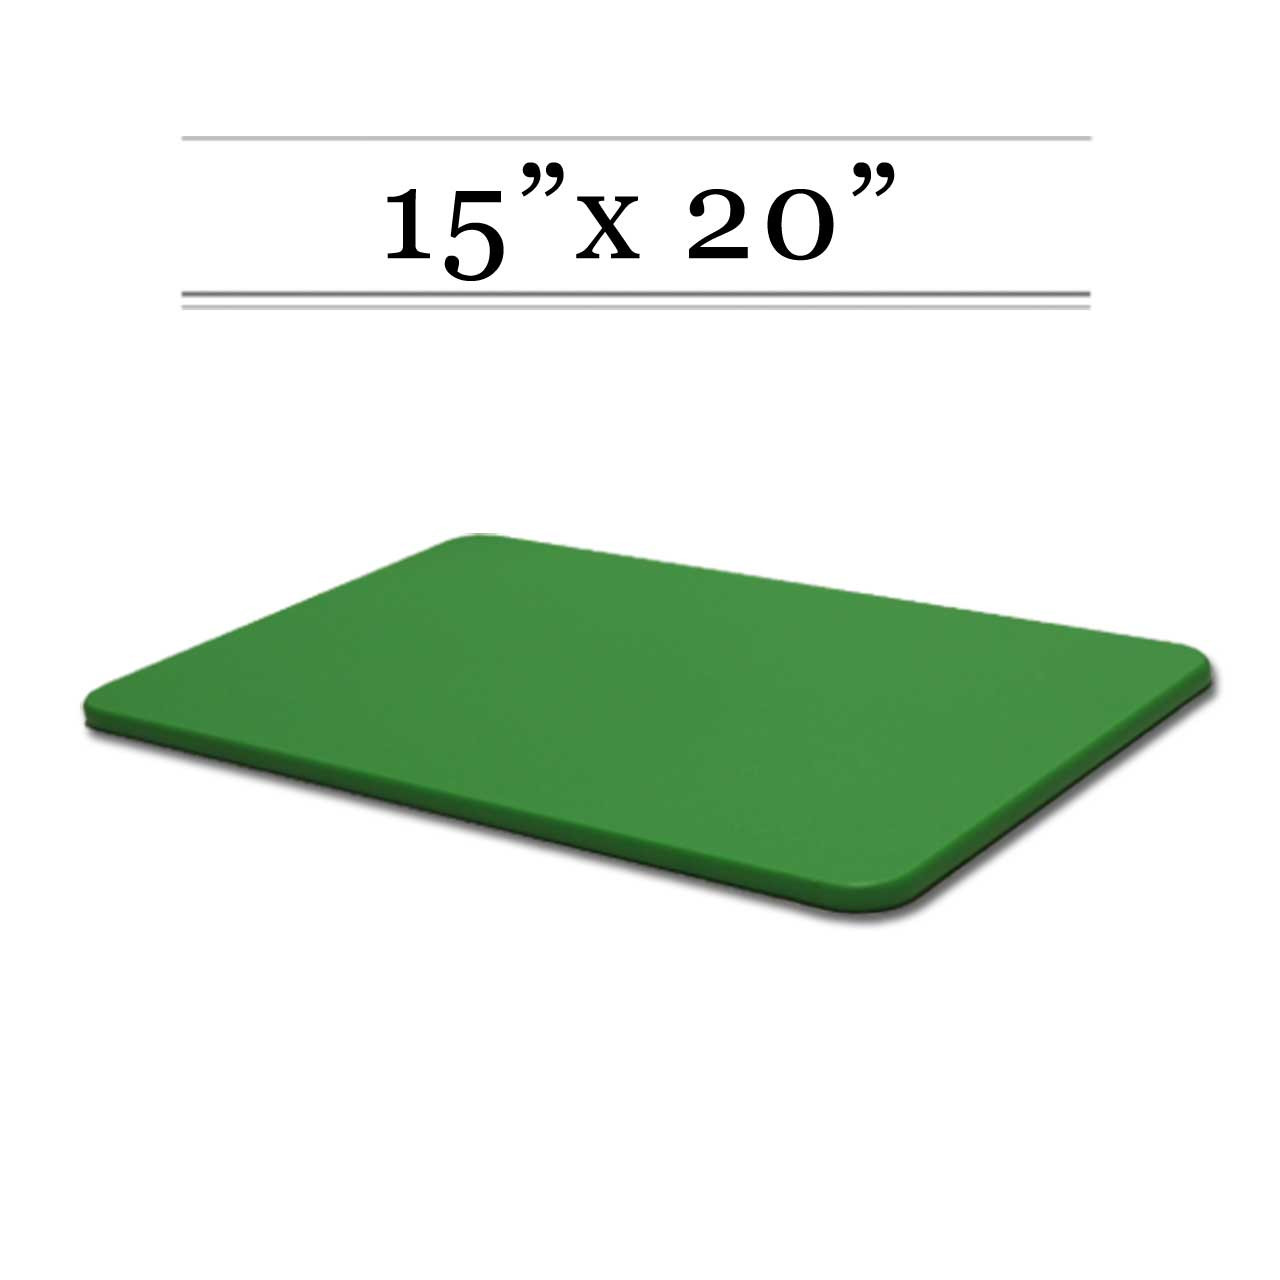 Catskill Kitchen Islands 15 X 20 Green Cutting Board Cutting Board Company